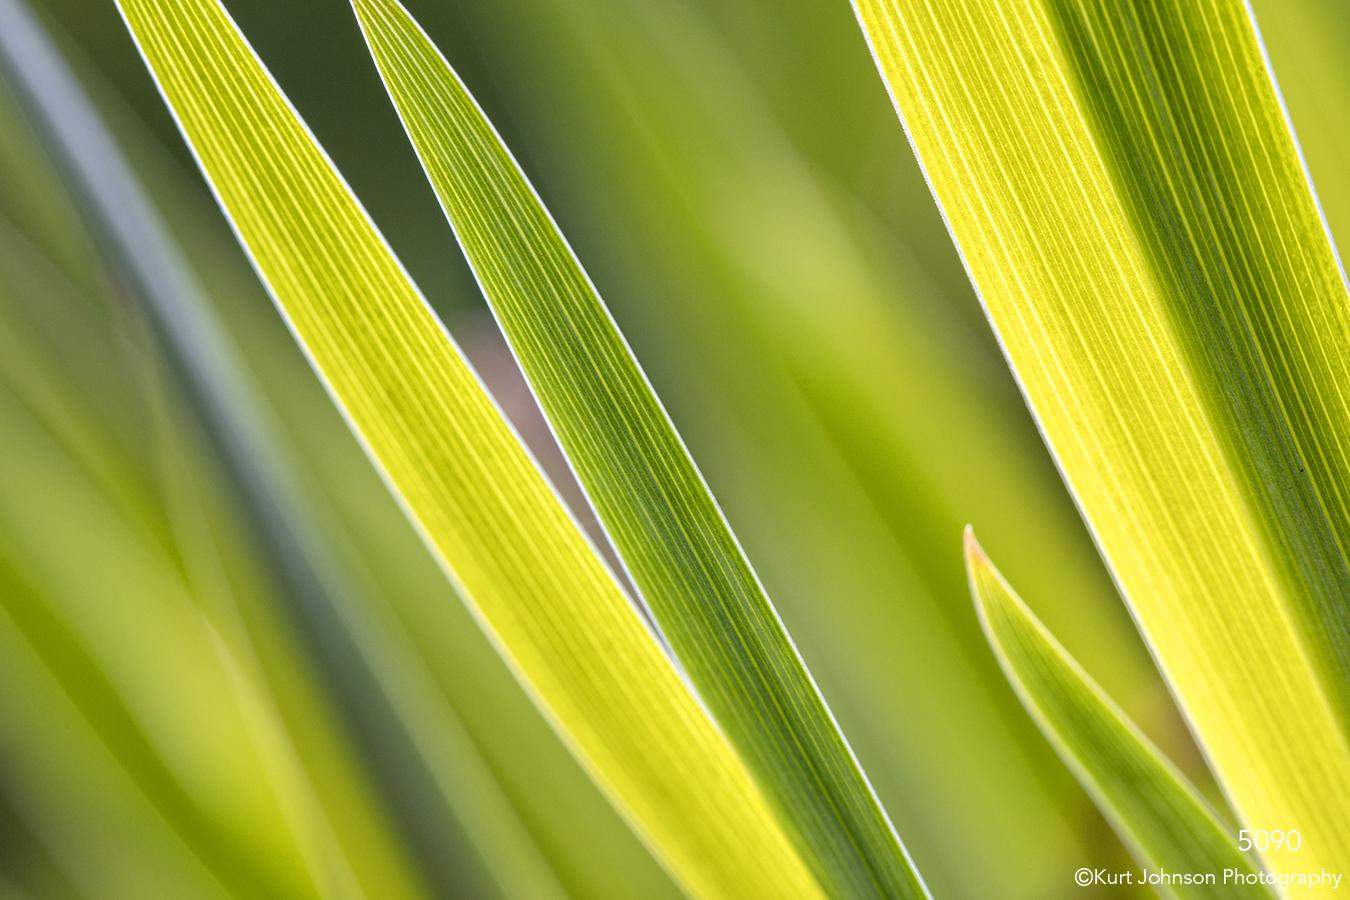 grasses green yellow detail texture